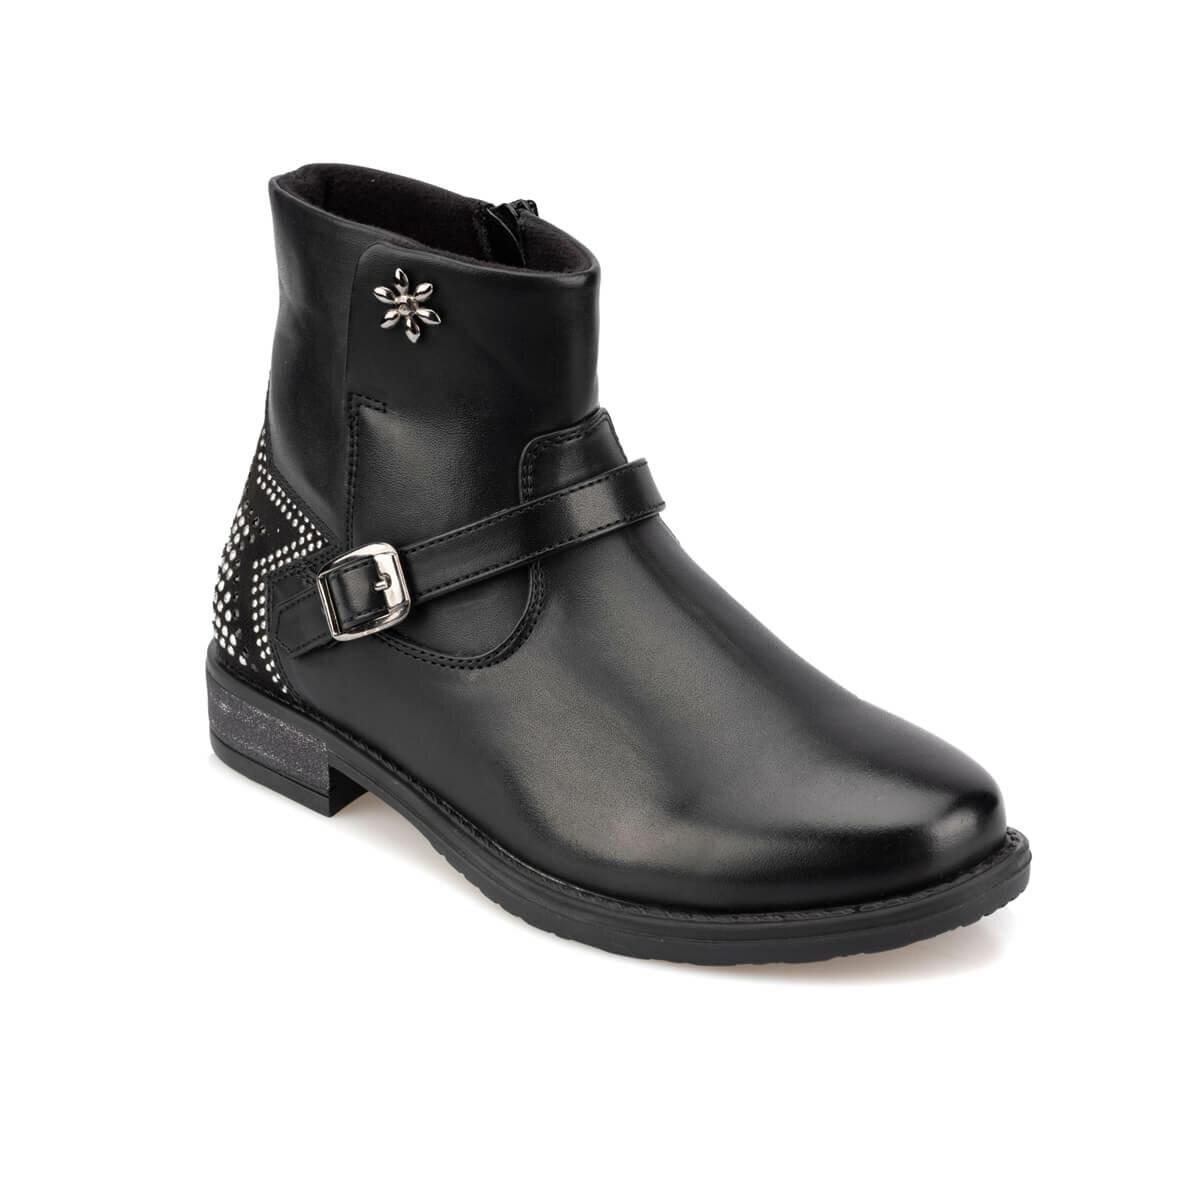 FLO 92.511817.F Black Female Child Boots Polaris